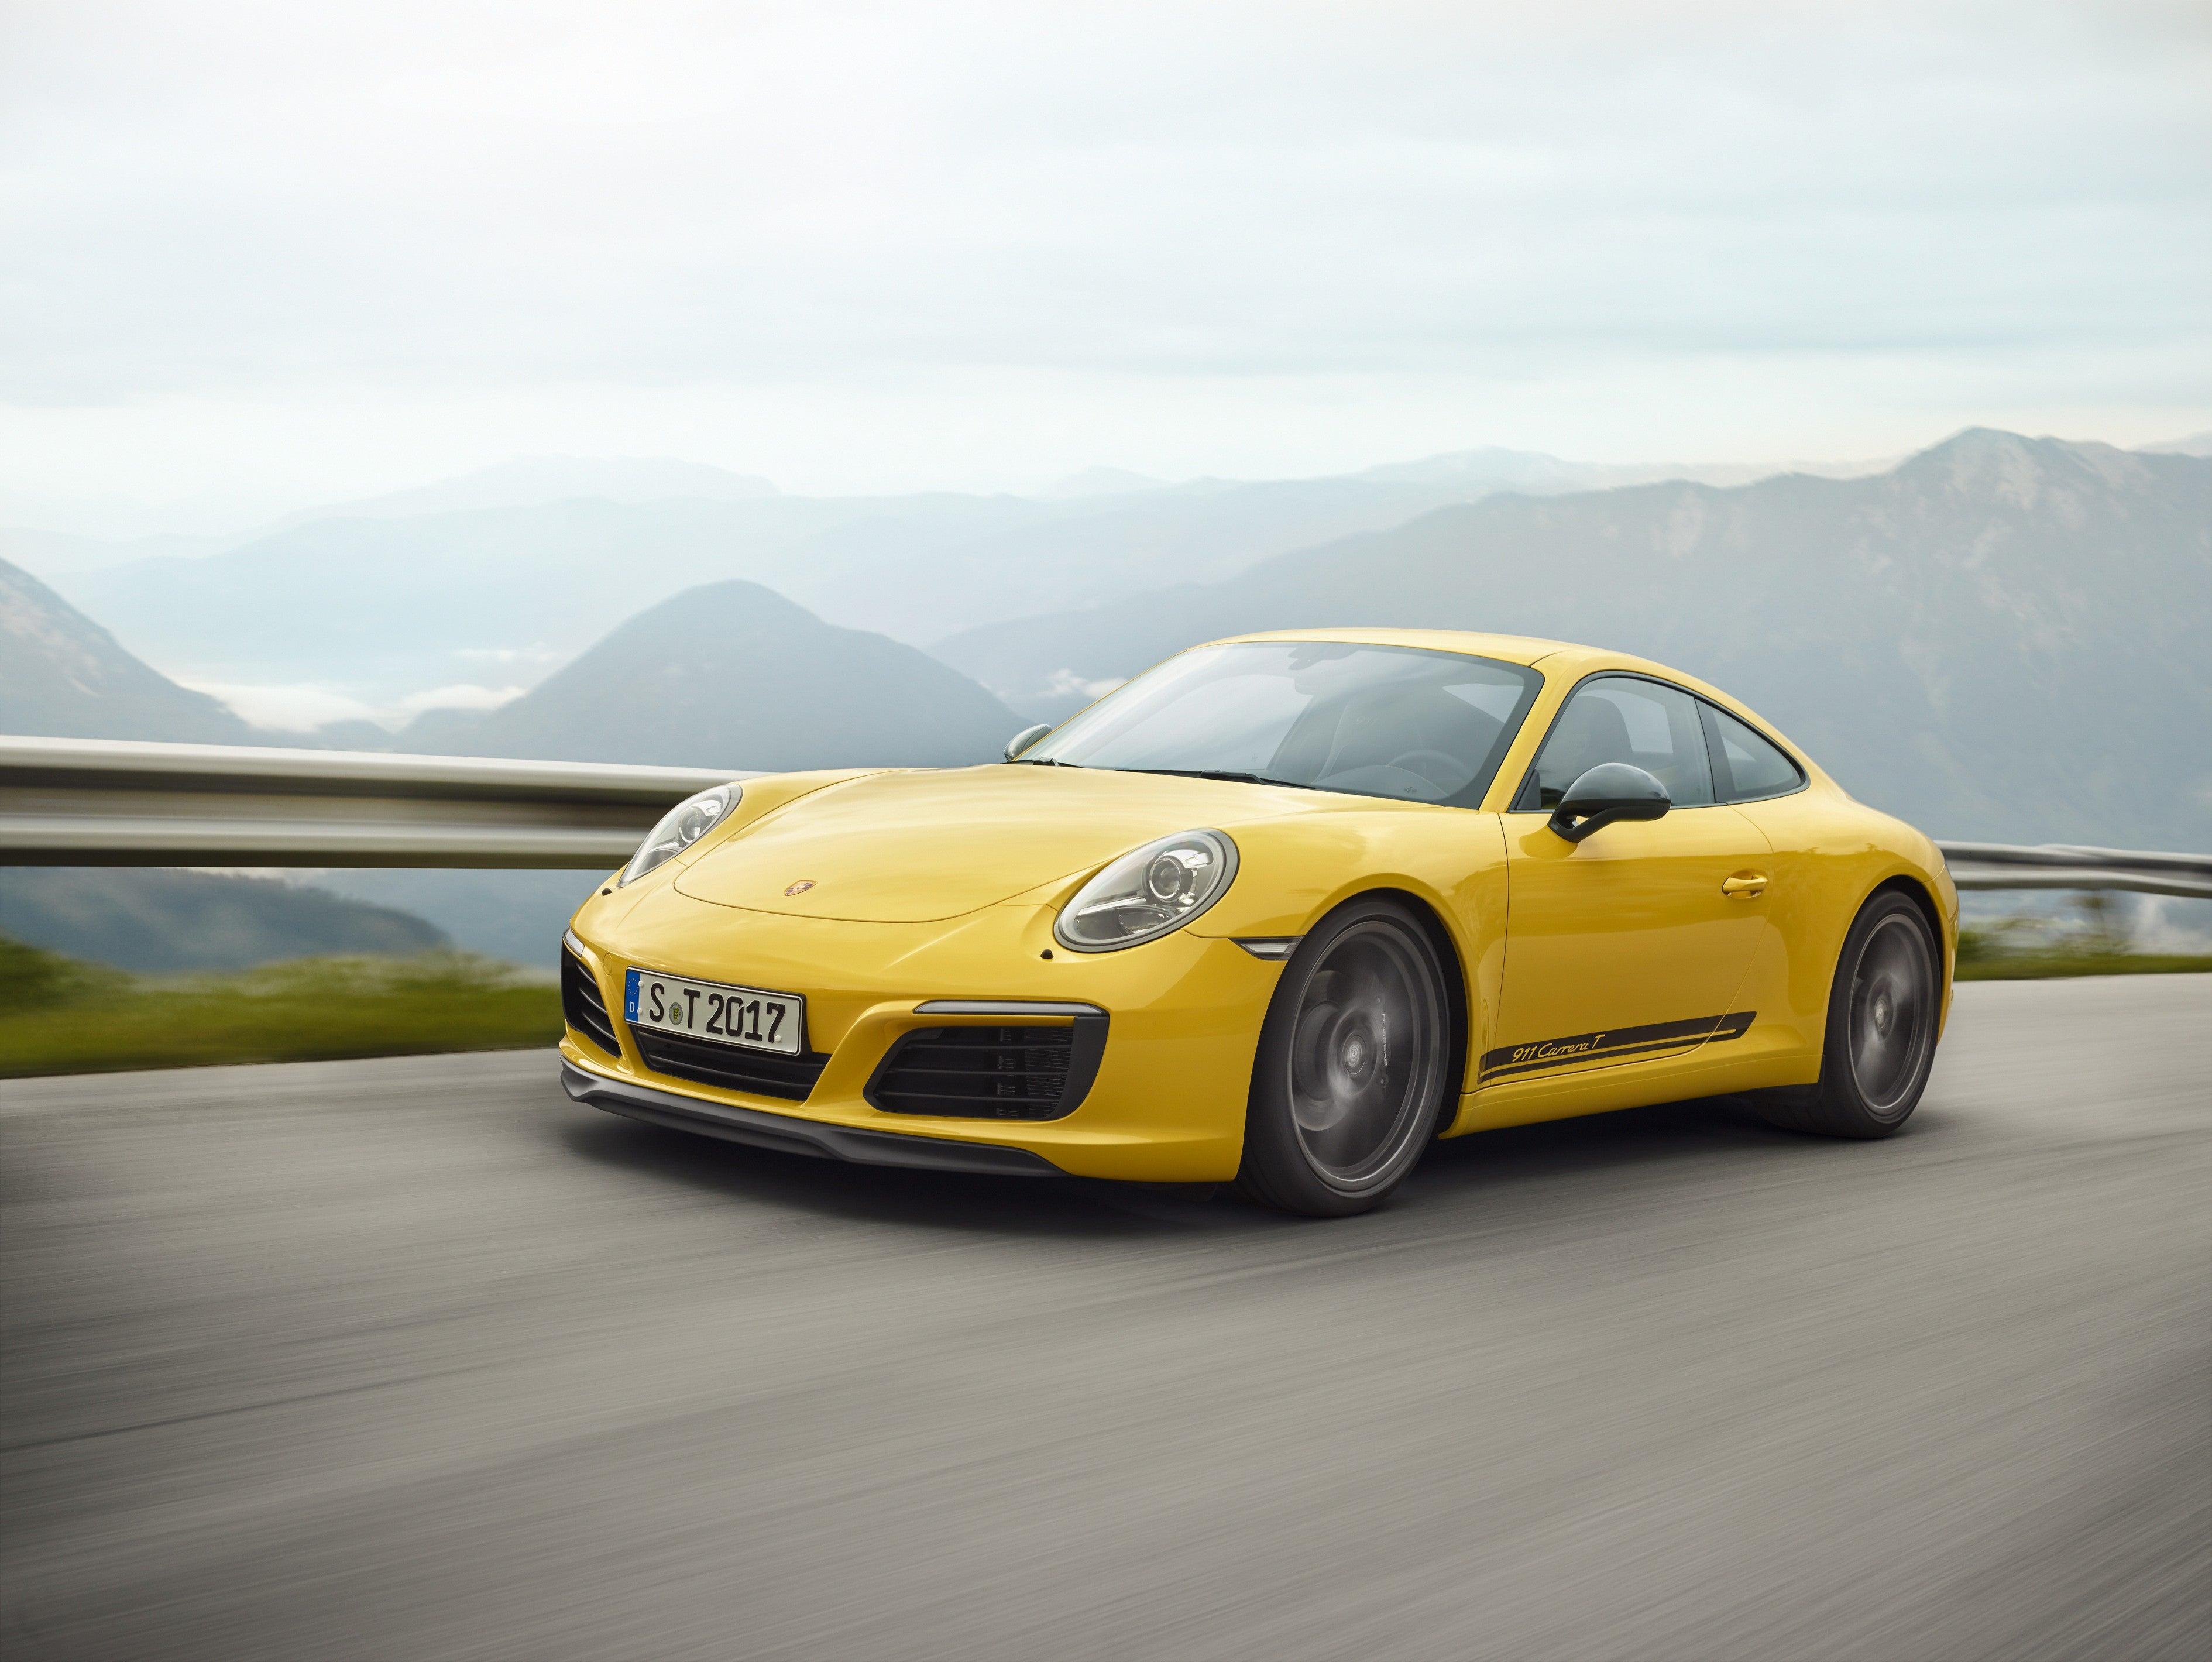 Porsche 4k Wallpapers For Your Desktop Or Mobile Screen Free